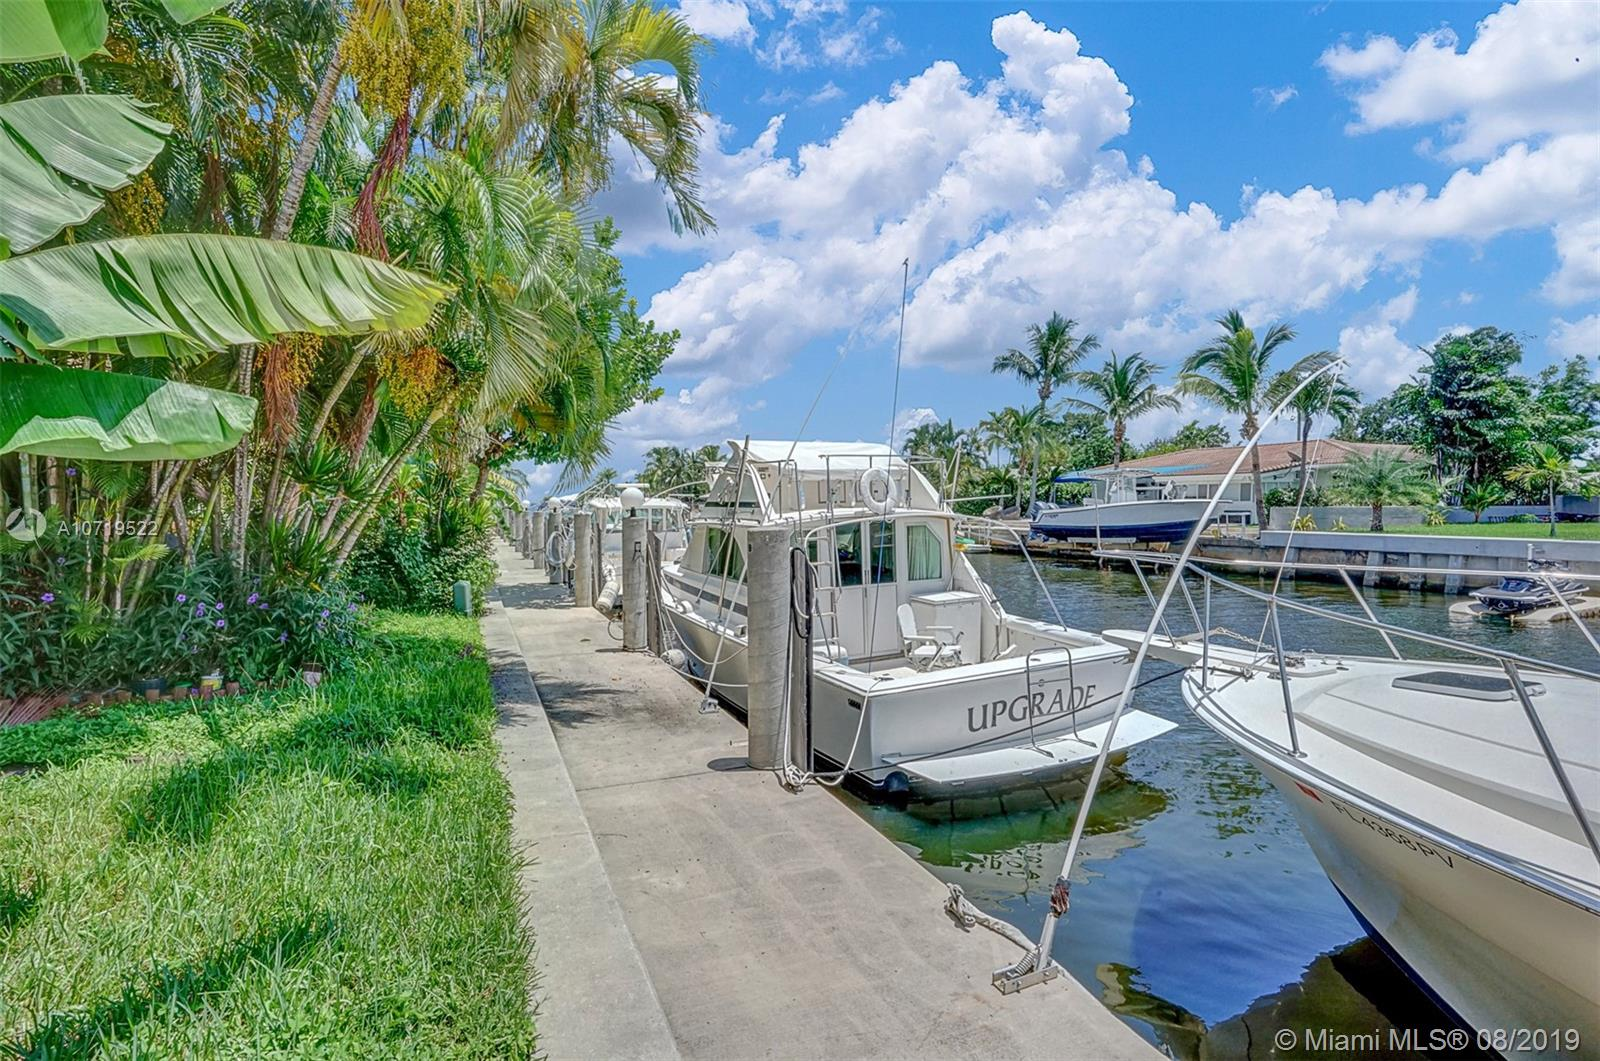 Miami Shores #B-12 - 39 - photo